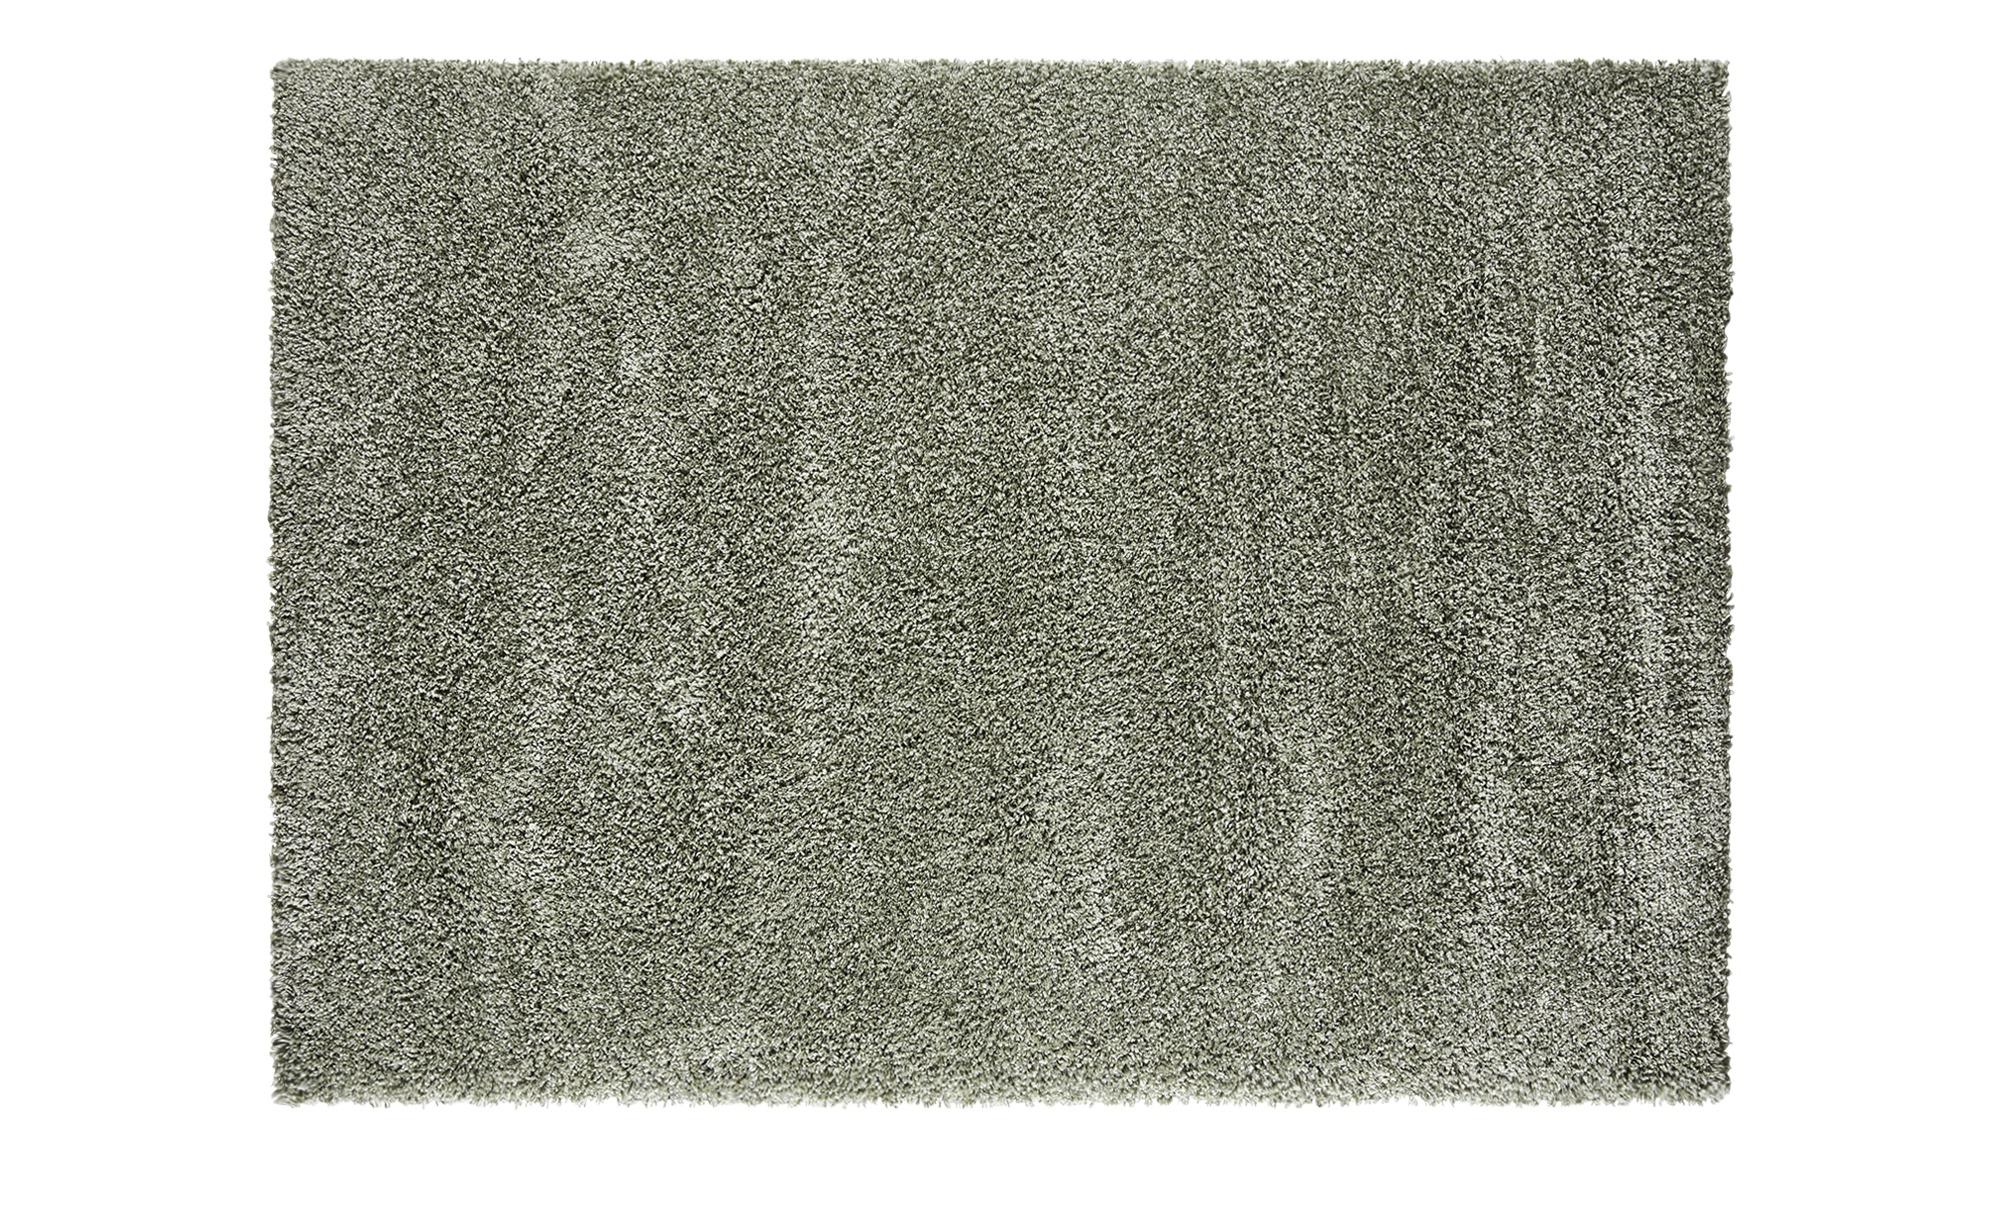 webteppich shaggy royal breite 140 cm h he grau online. Black Bedroom Furniture Sets. Home Design Ideas